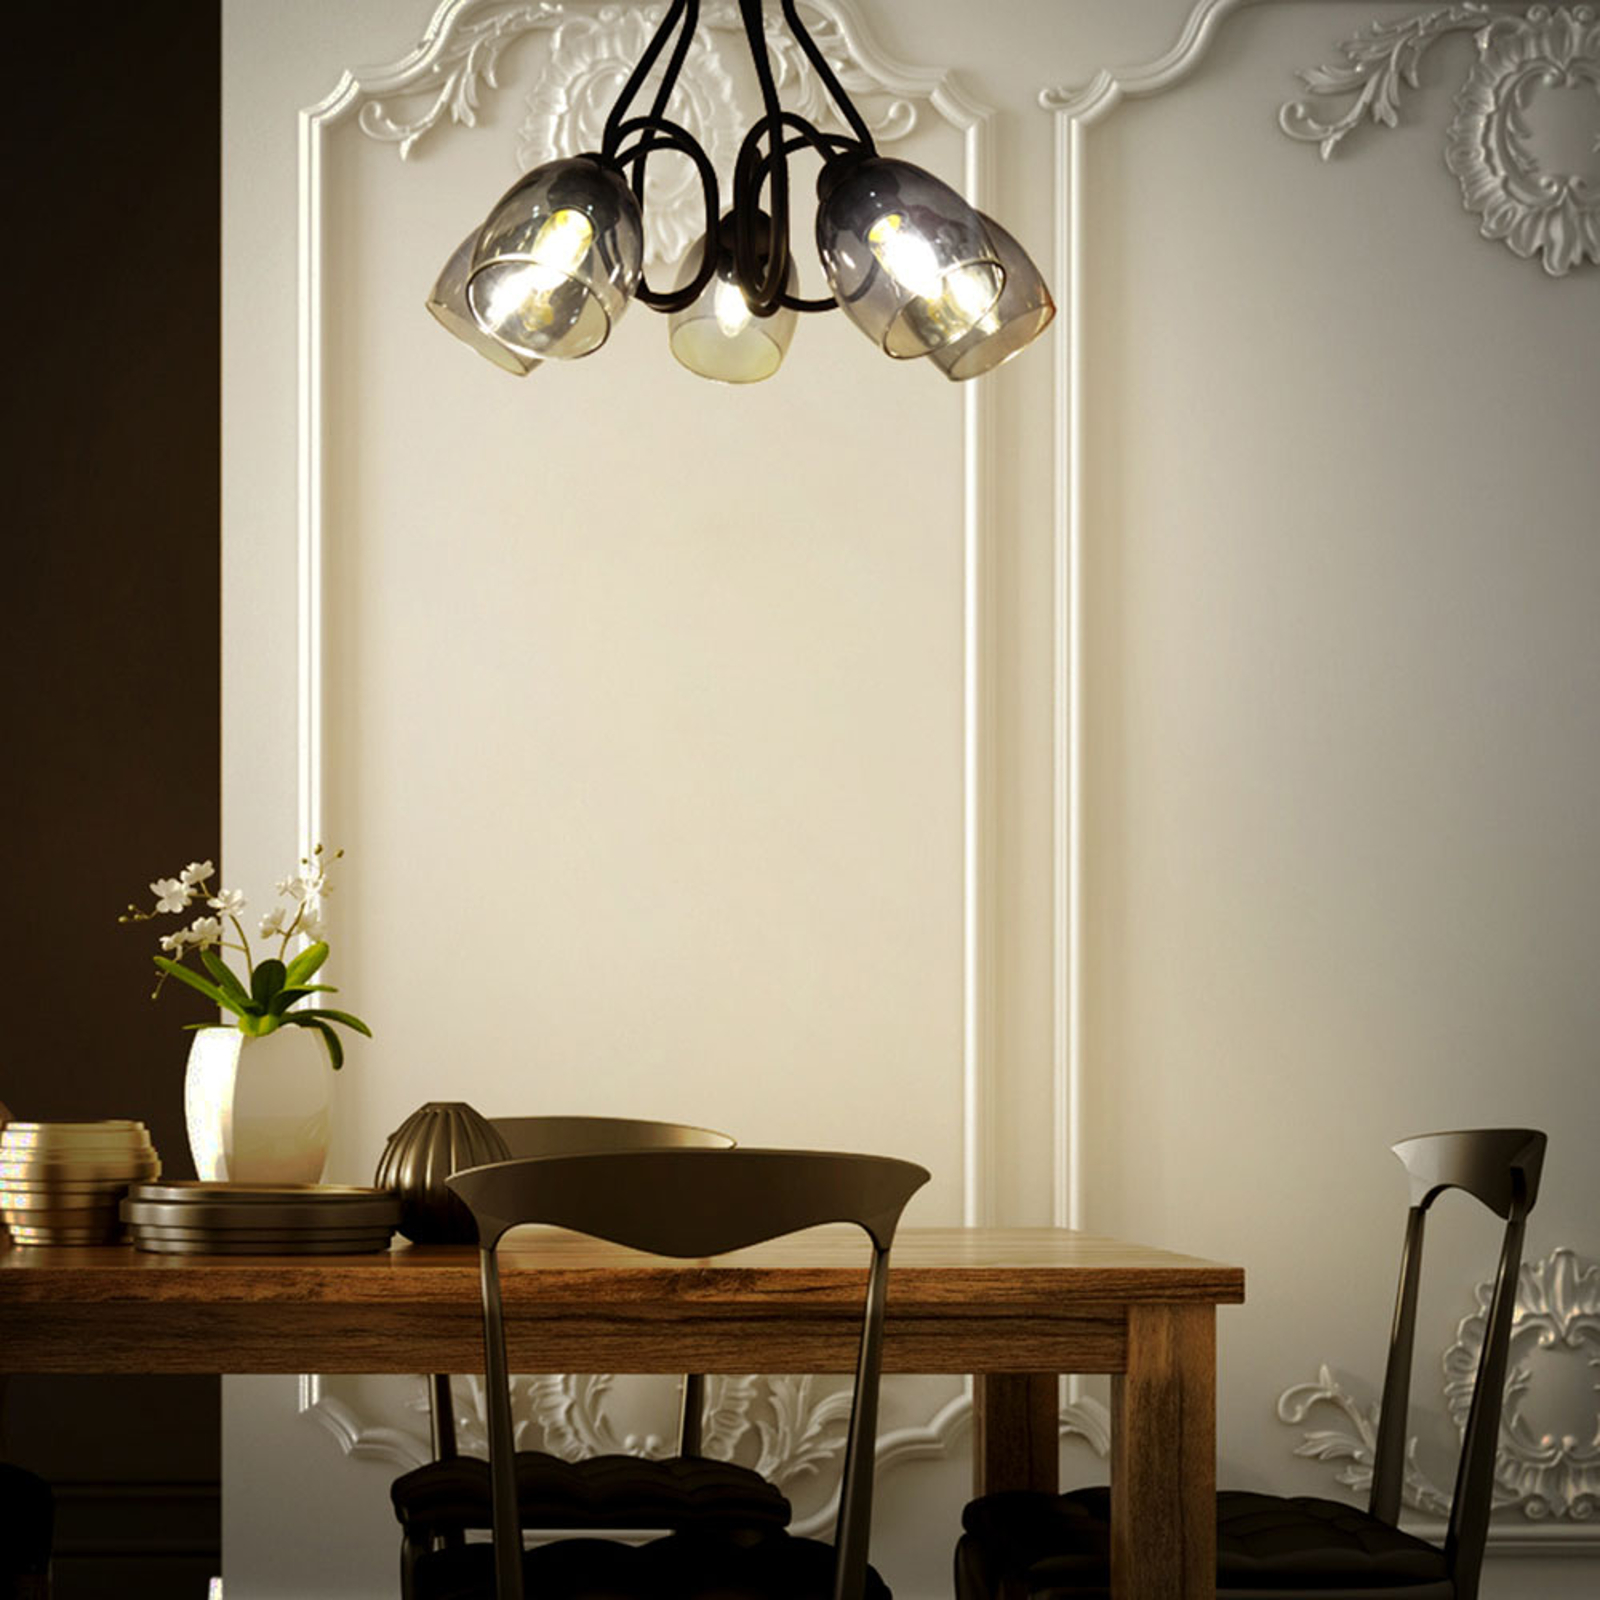 Plafondlamp Marietta 5lamps + glazen kappen smoke